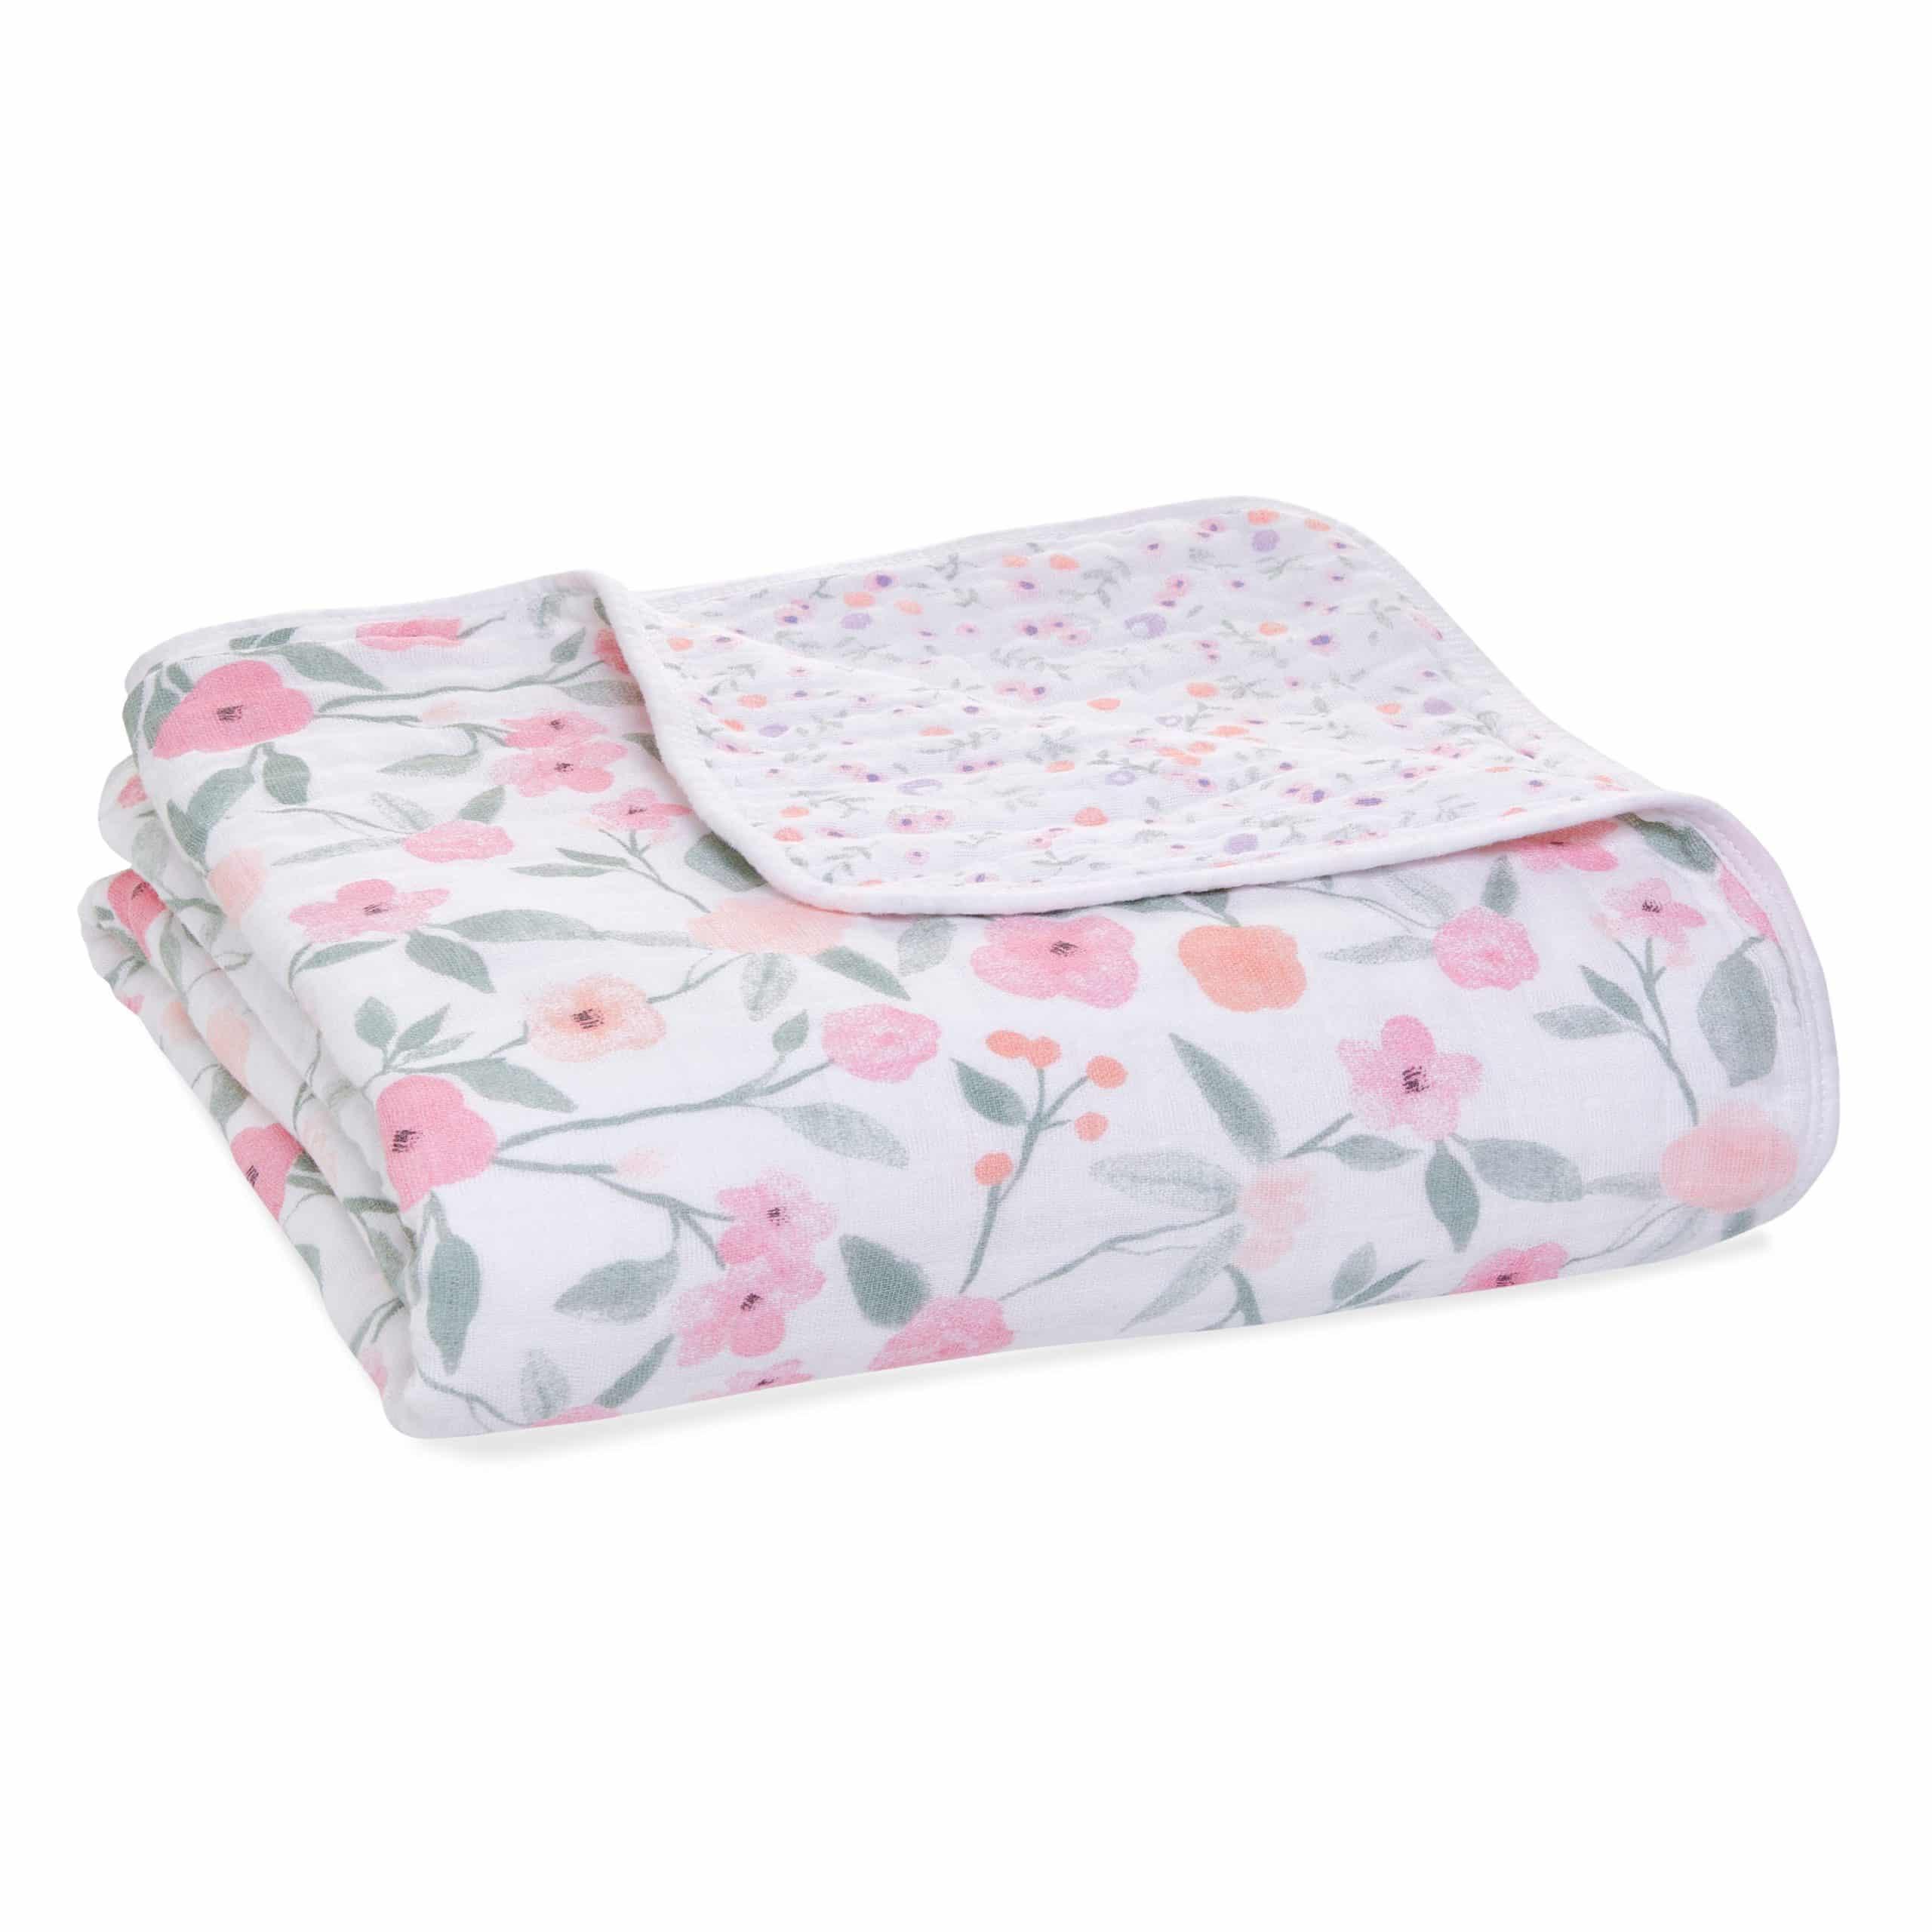 baby-cotton-muslin-dream-blanket-mon-fluer_1-scaled-1